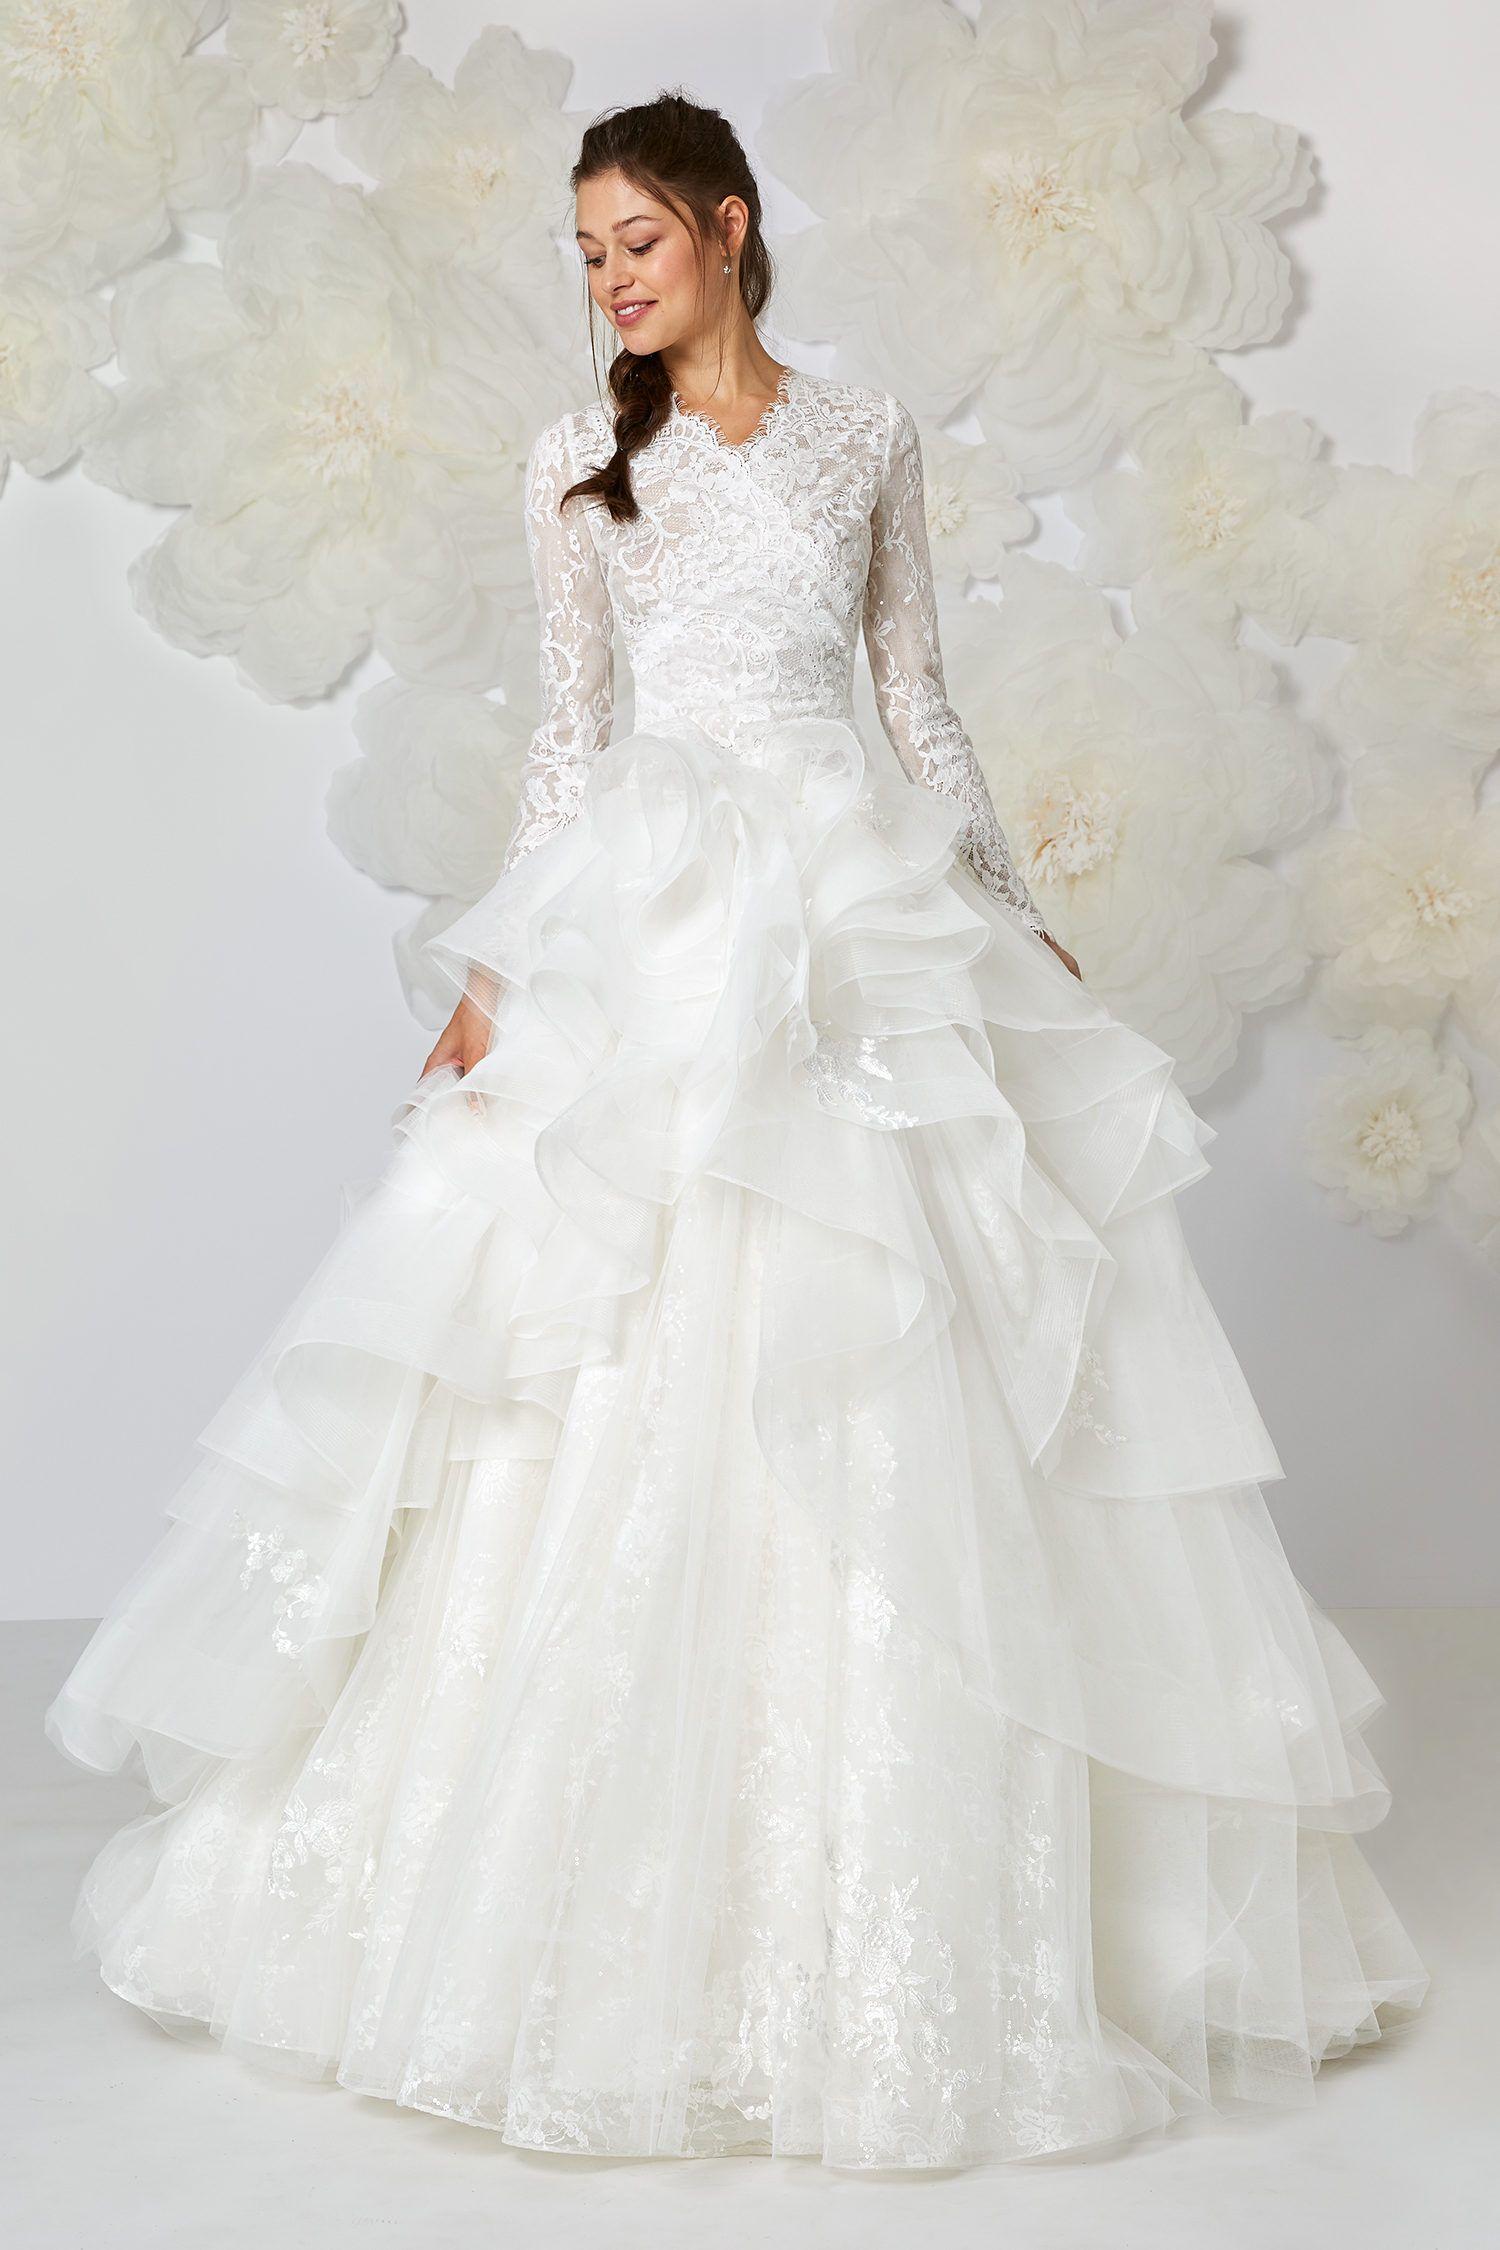 Lace wedding dress 2018 pinterest